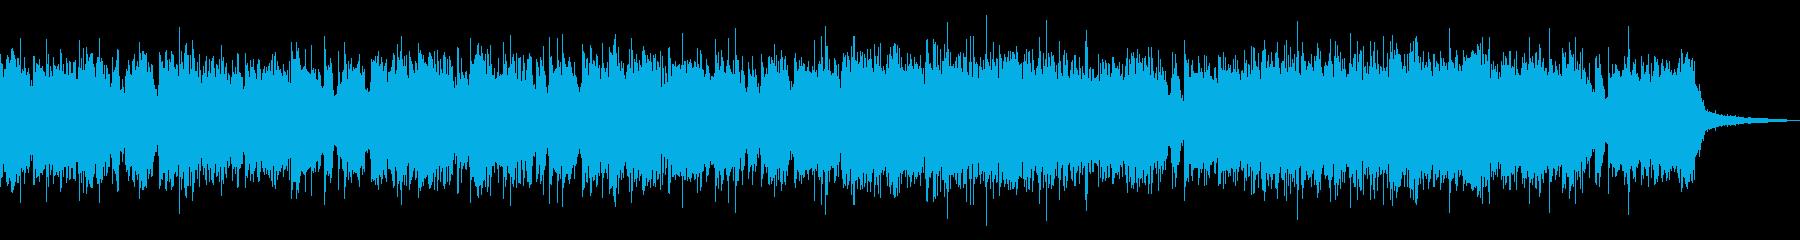 Brain Destruction30秒の再生済みの波形